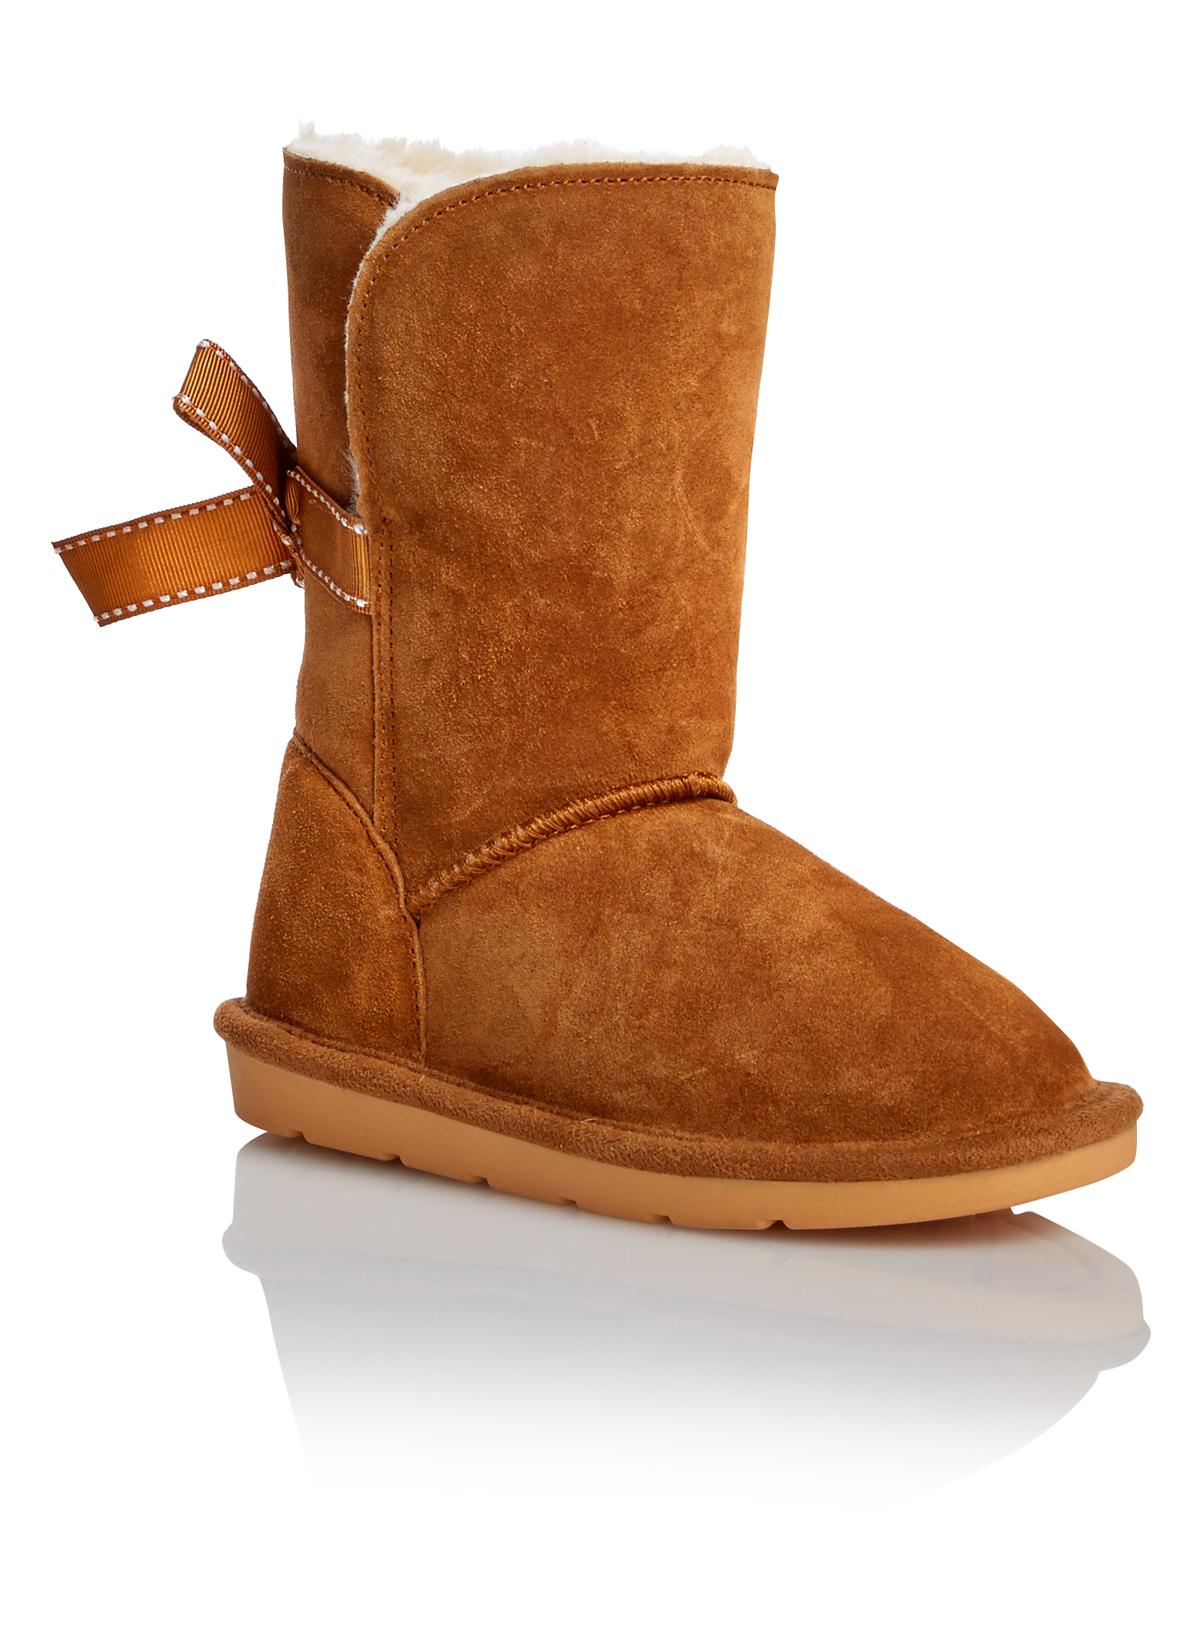 All Girl's Clothing Girls Tan Fur Boots | Tu clothing